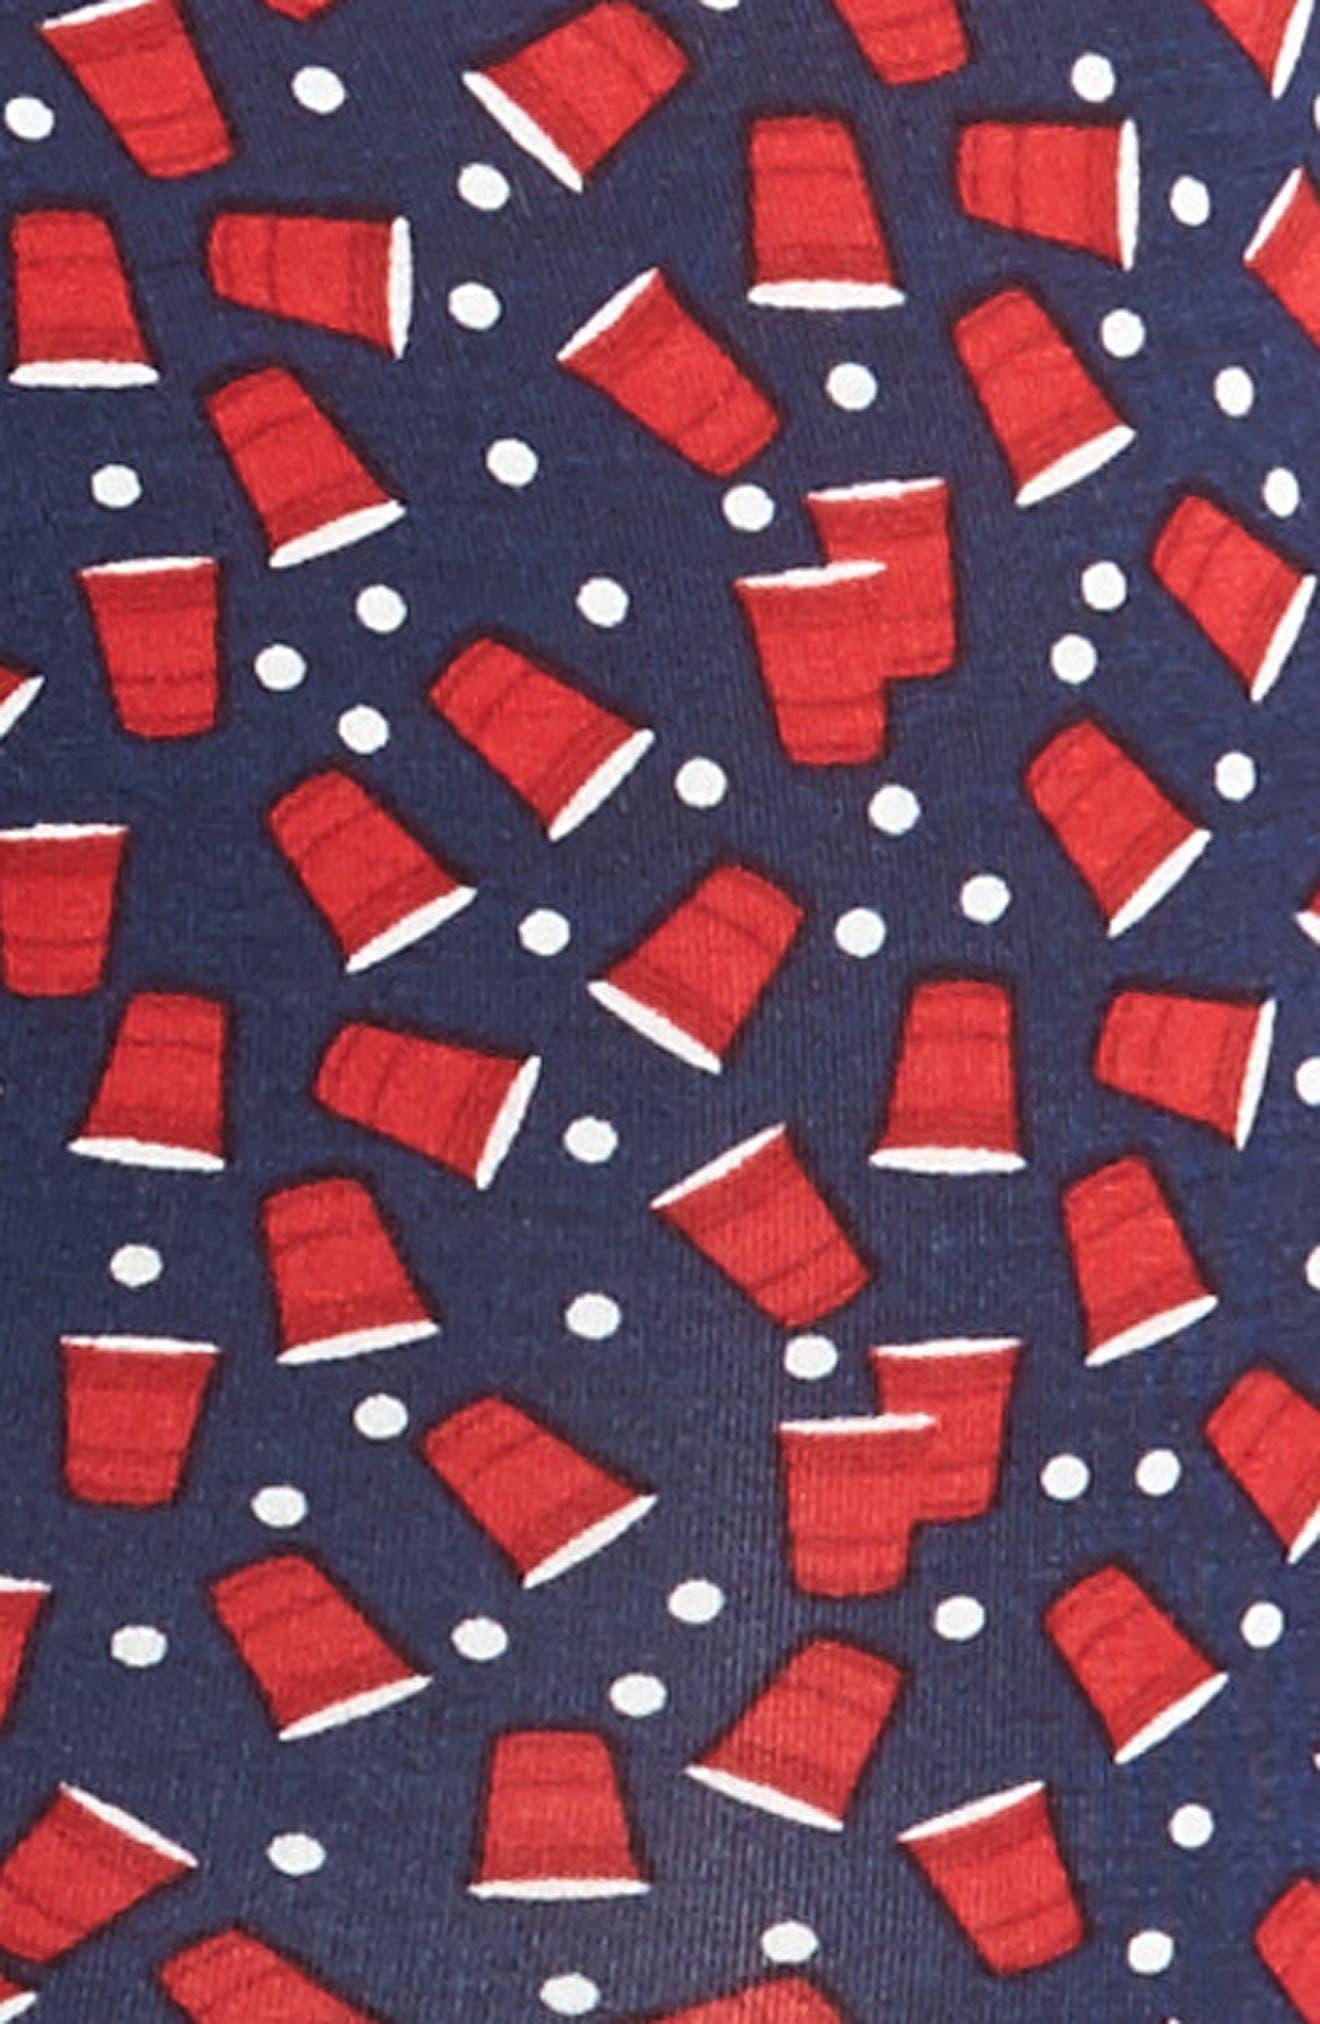 Vibe Print Boxer Briefs,                             Alternate thumbnail 4, color,                             Beer Pong